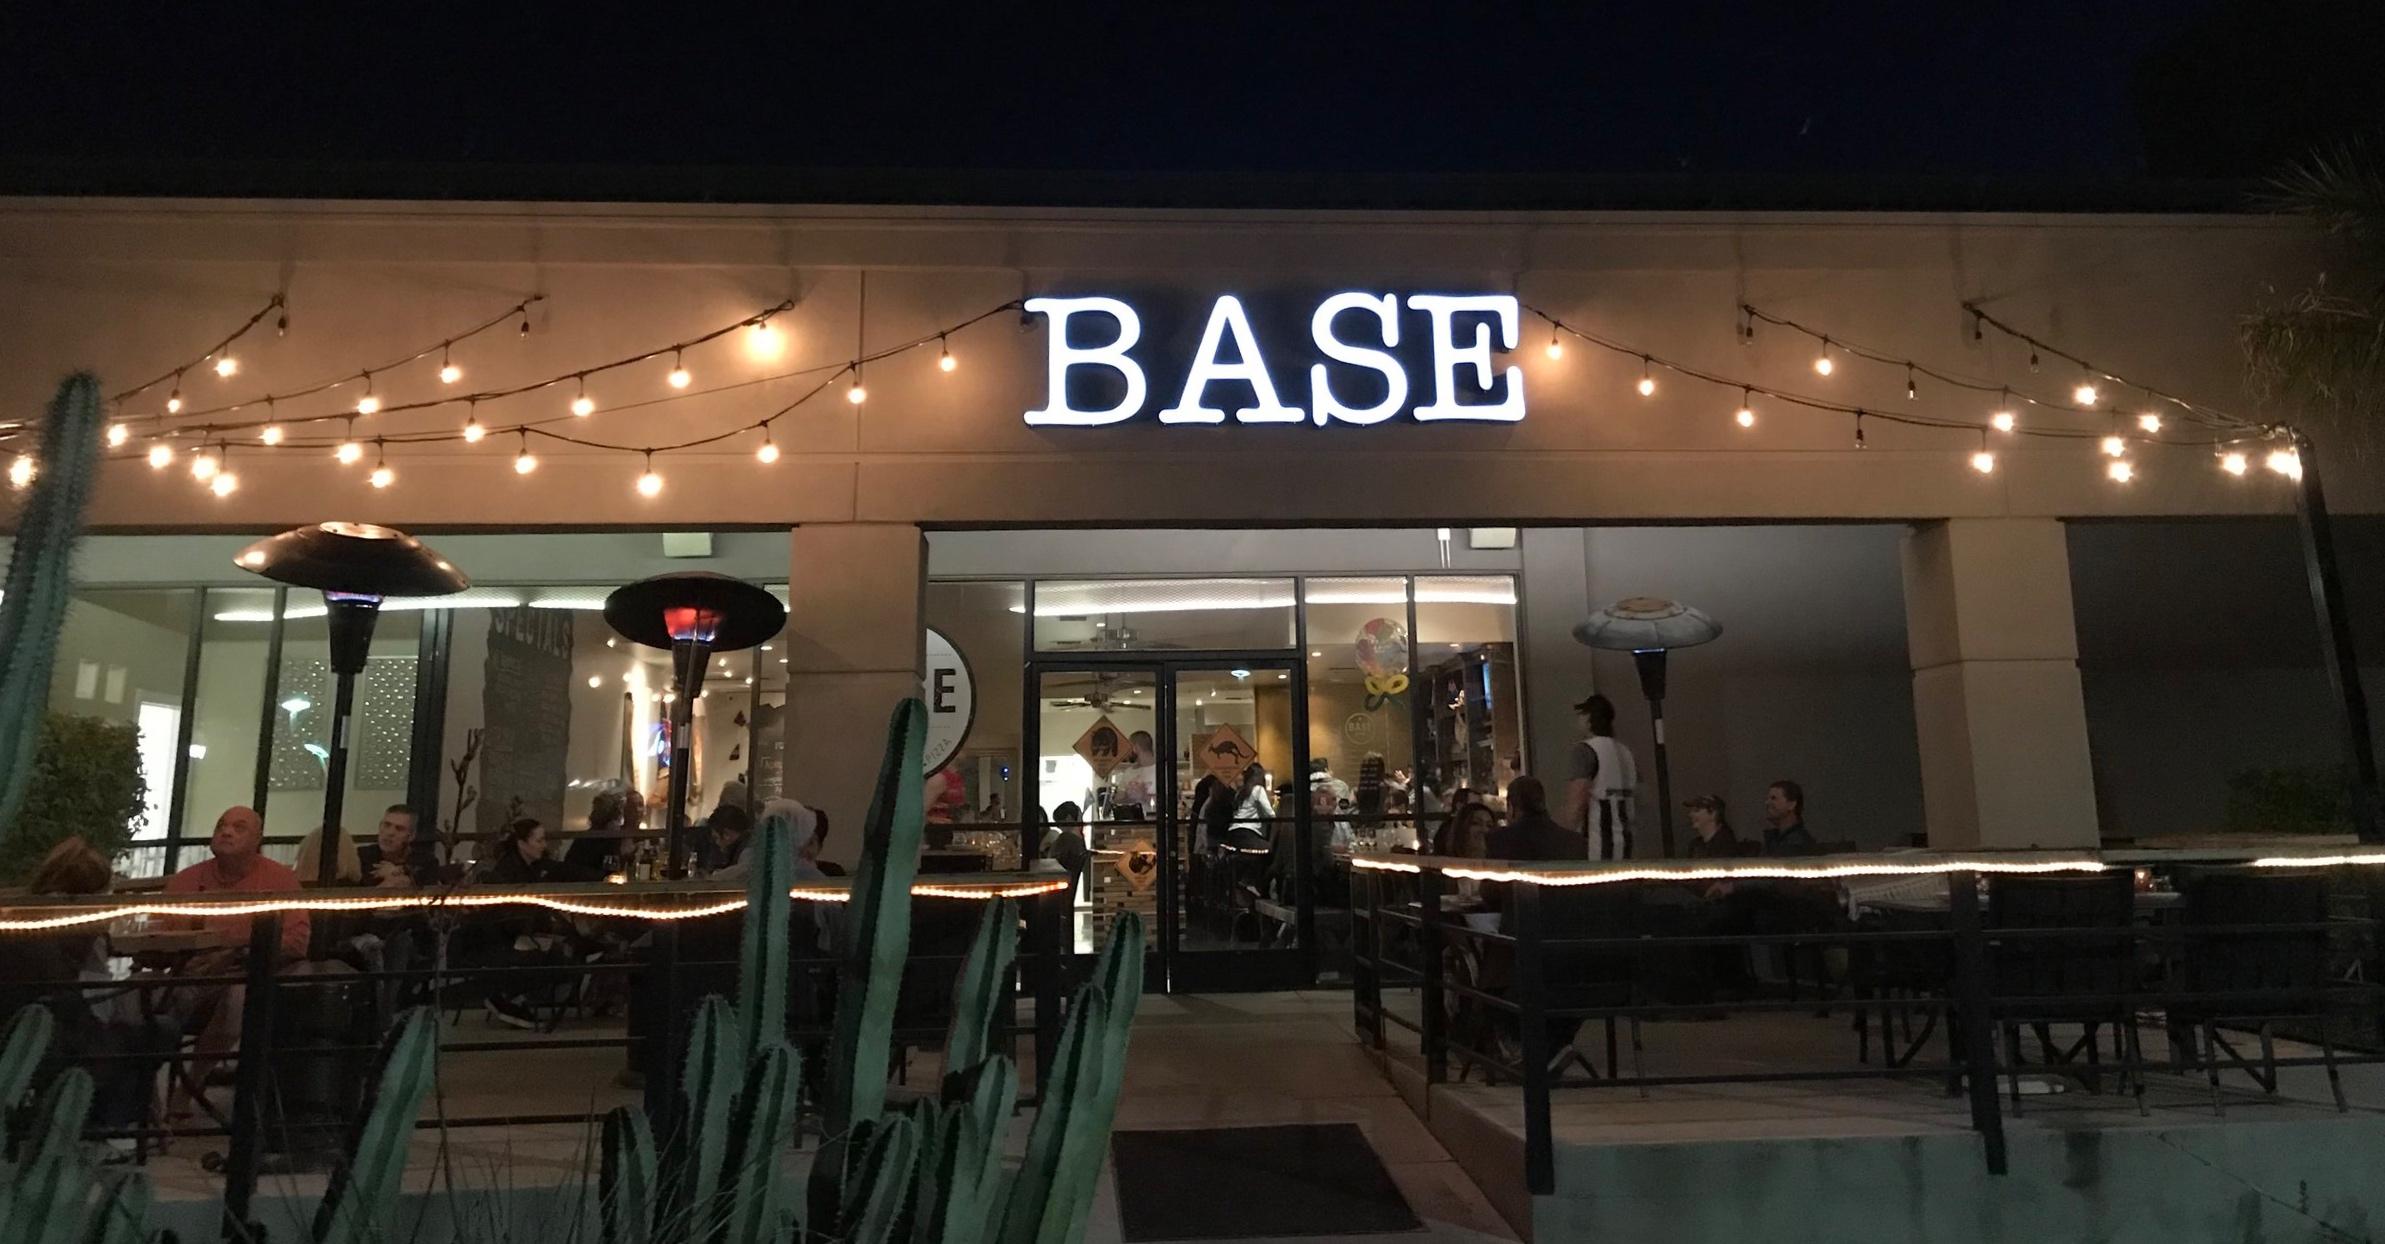 Base Pizzeria  serves delicious gourmet pizza.